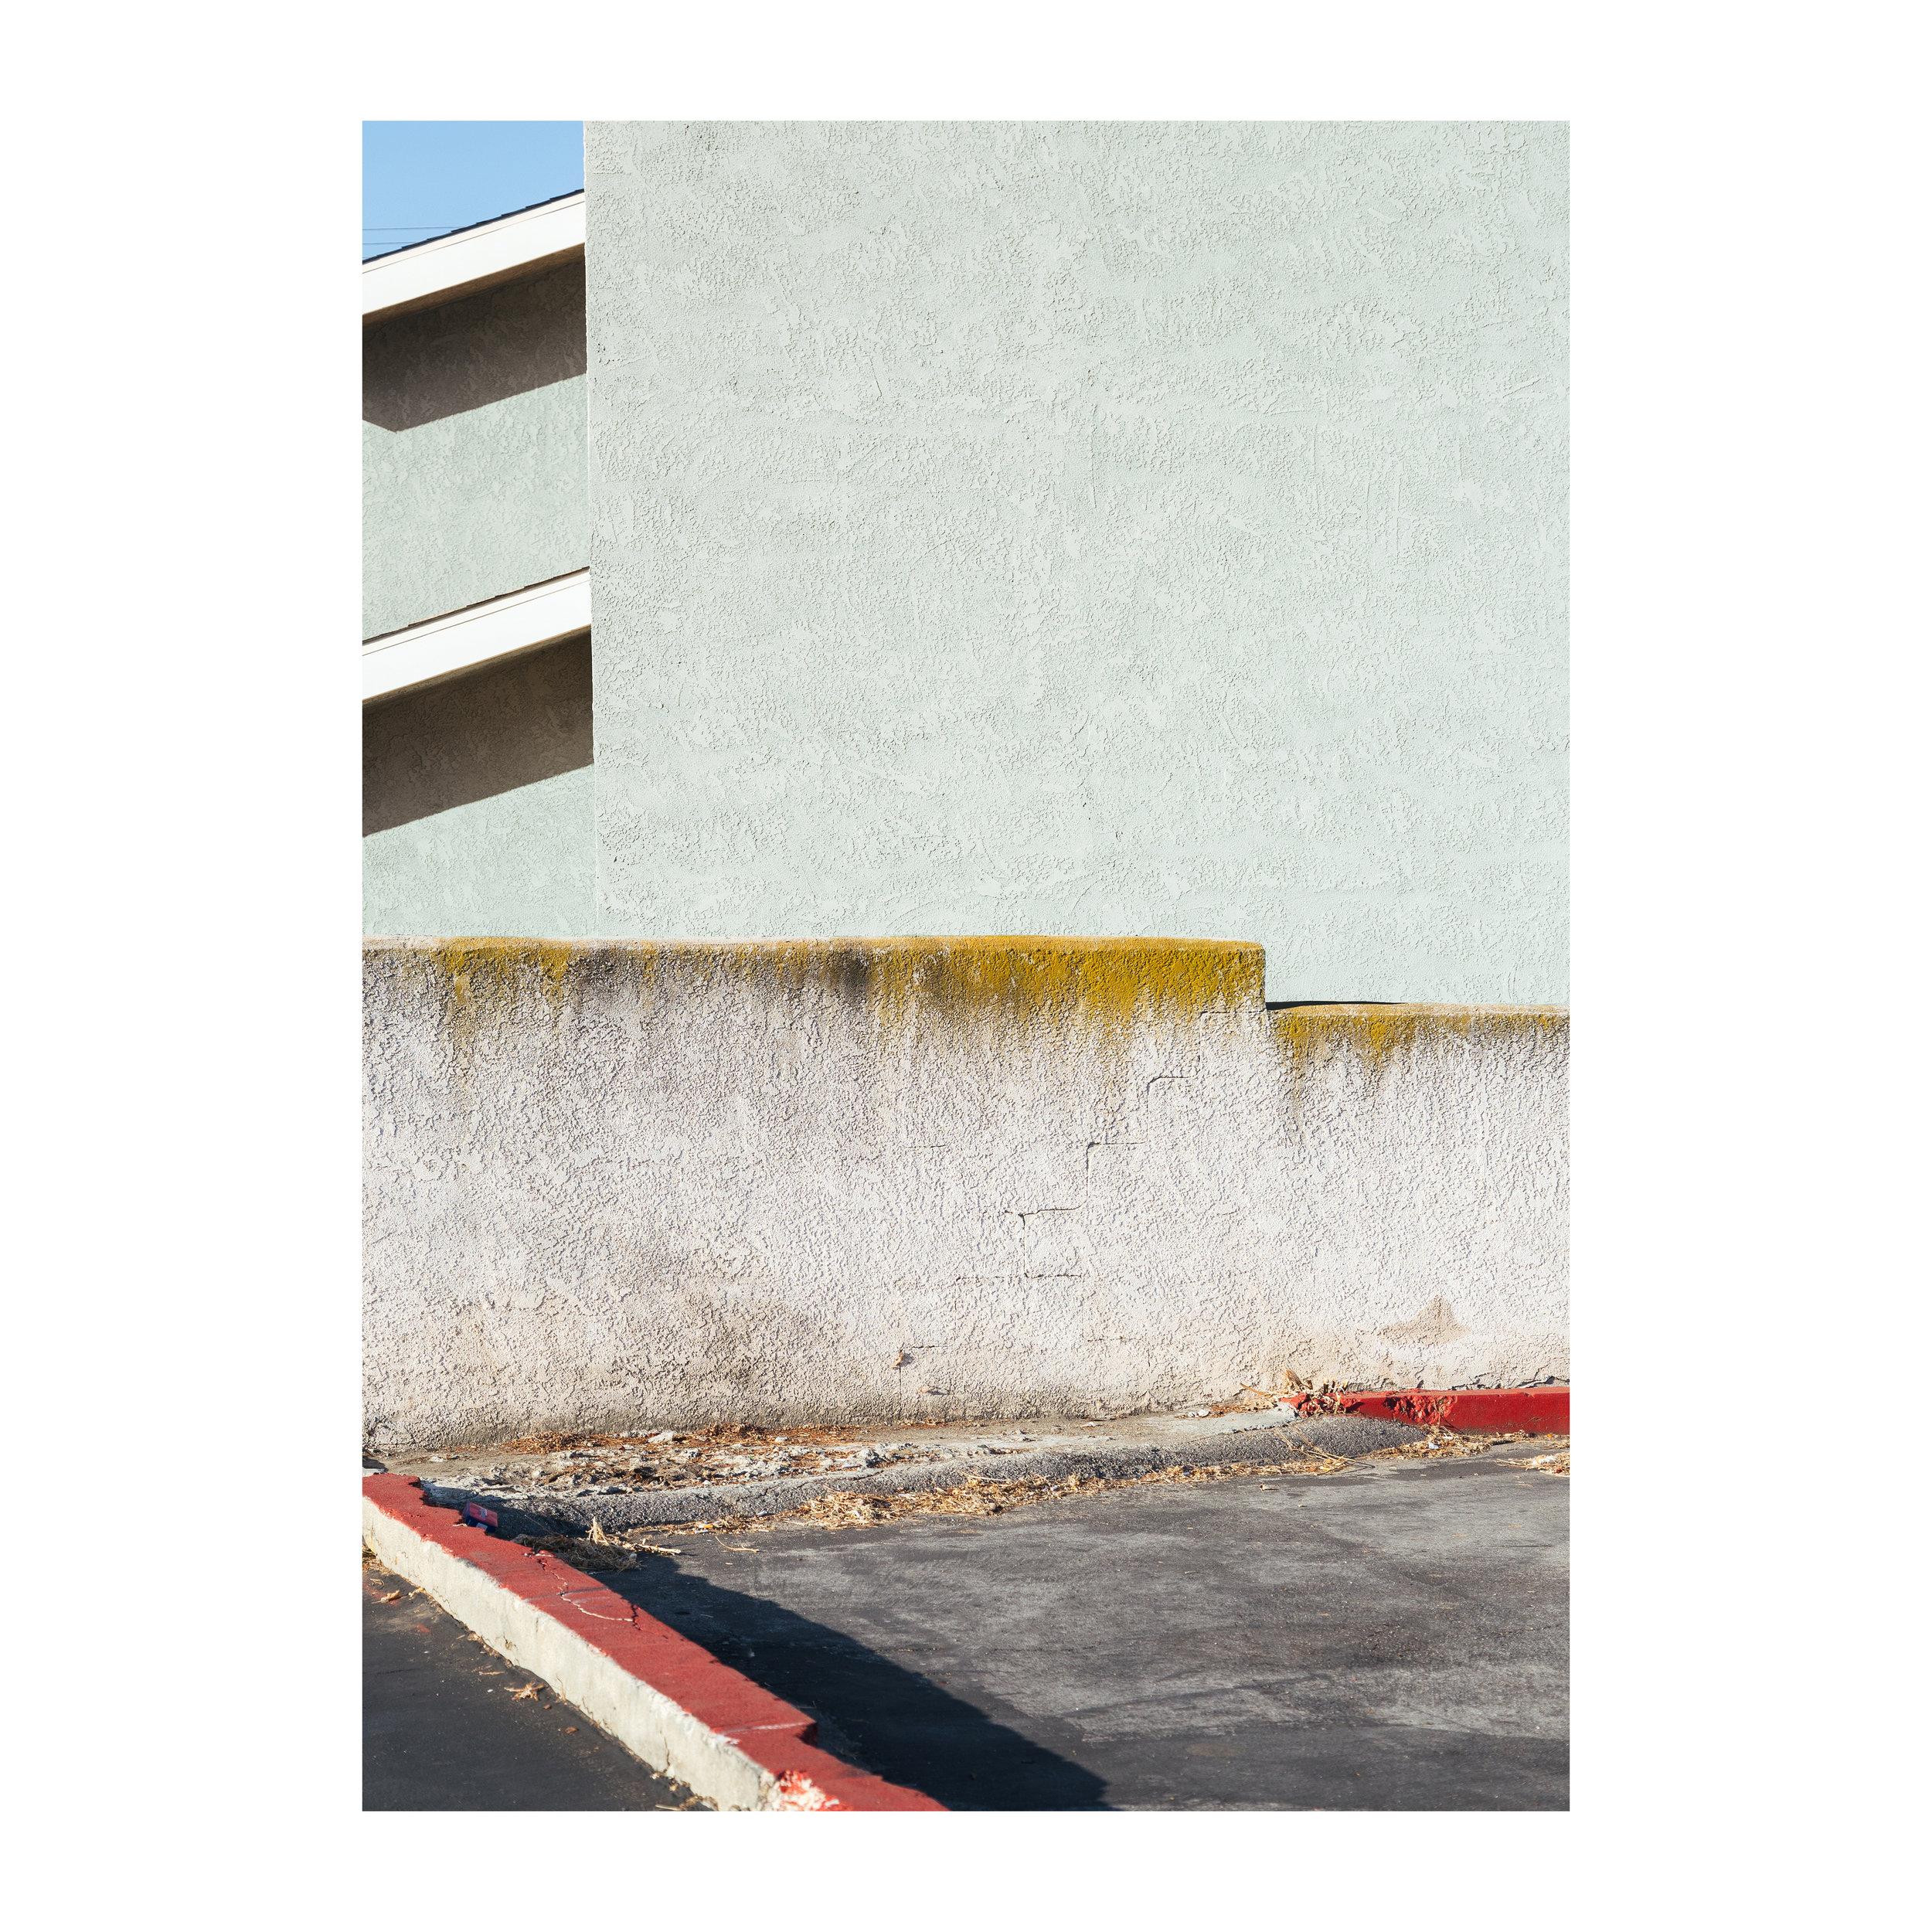 "Layers of Seeing;Whittier, California  Lightjet Kodak Endura C-Print, 30.0"" x 20.0""  Signed, 2017  Edition of Four + 1 Artist Proof"